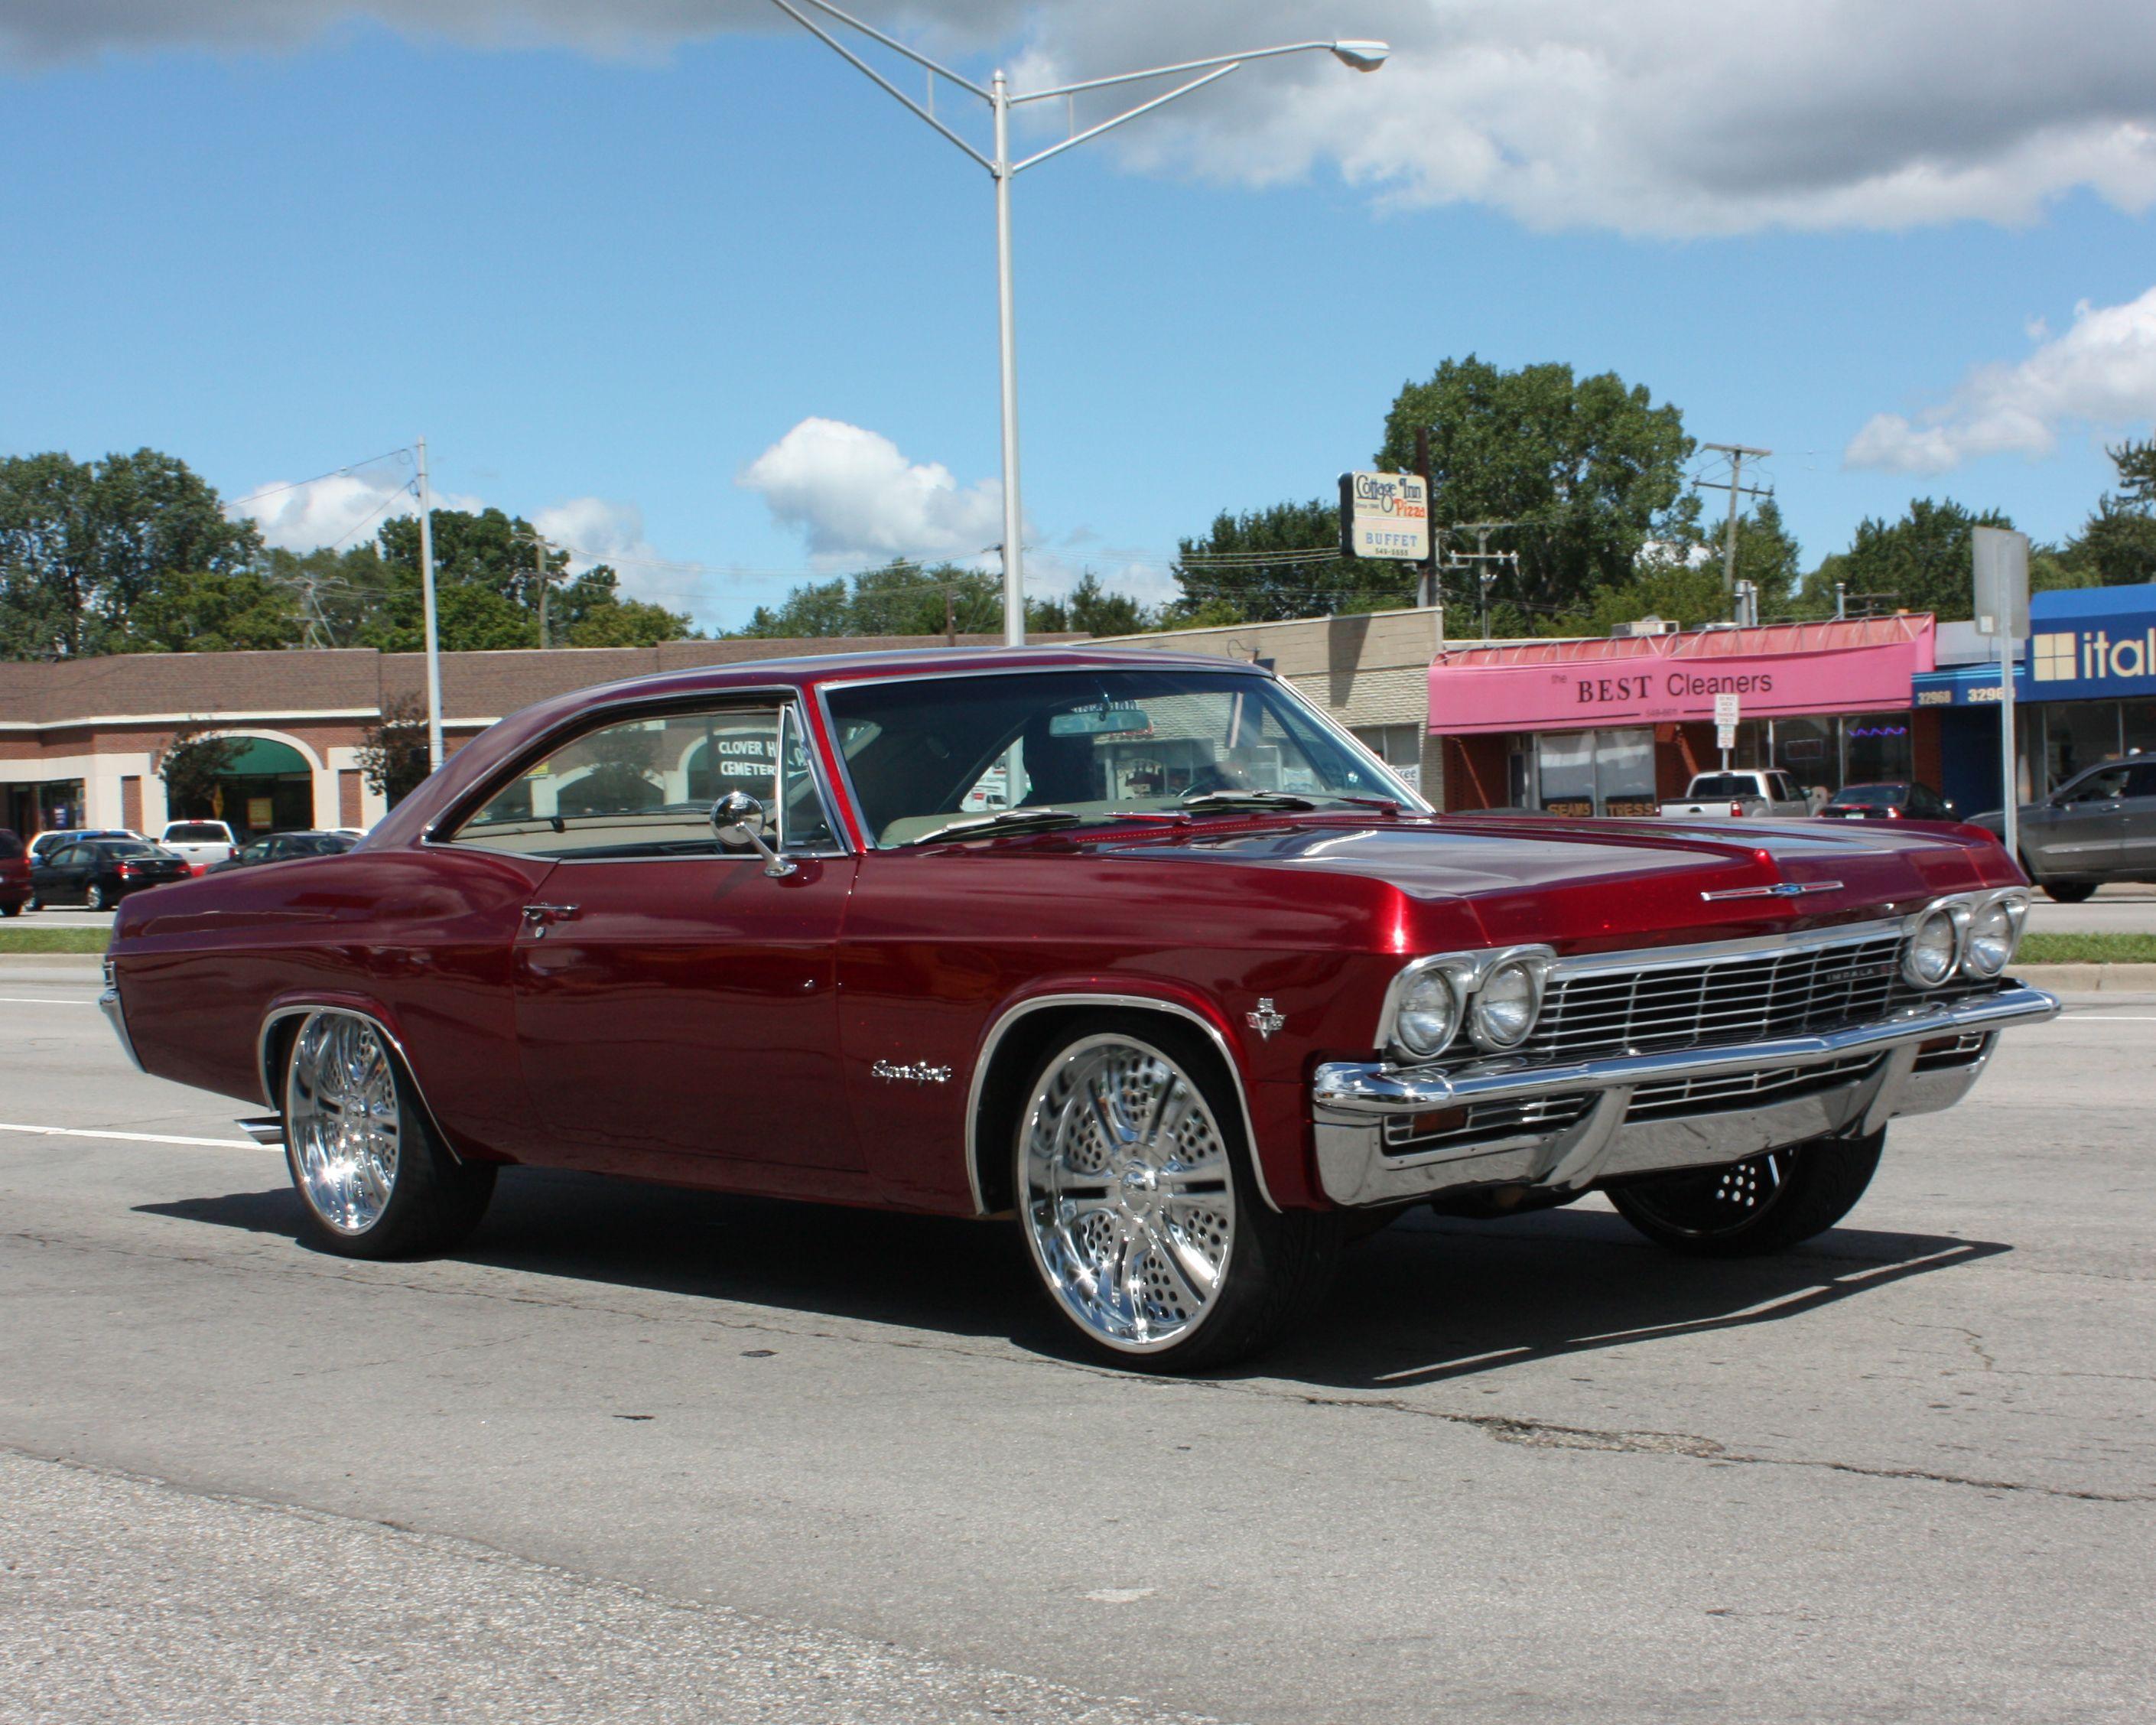 1965 chevy impala super sport lowriders pinterest chevy impala rh pinterest com super sport impala 2018 1965 super sport impala